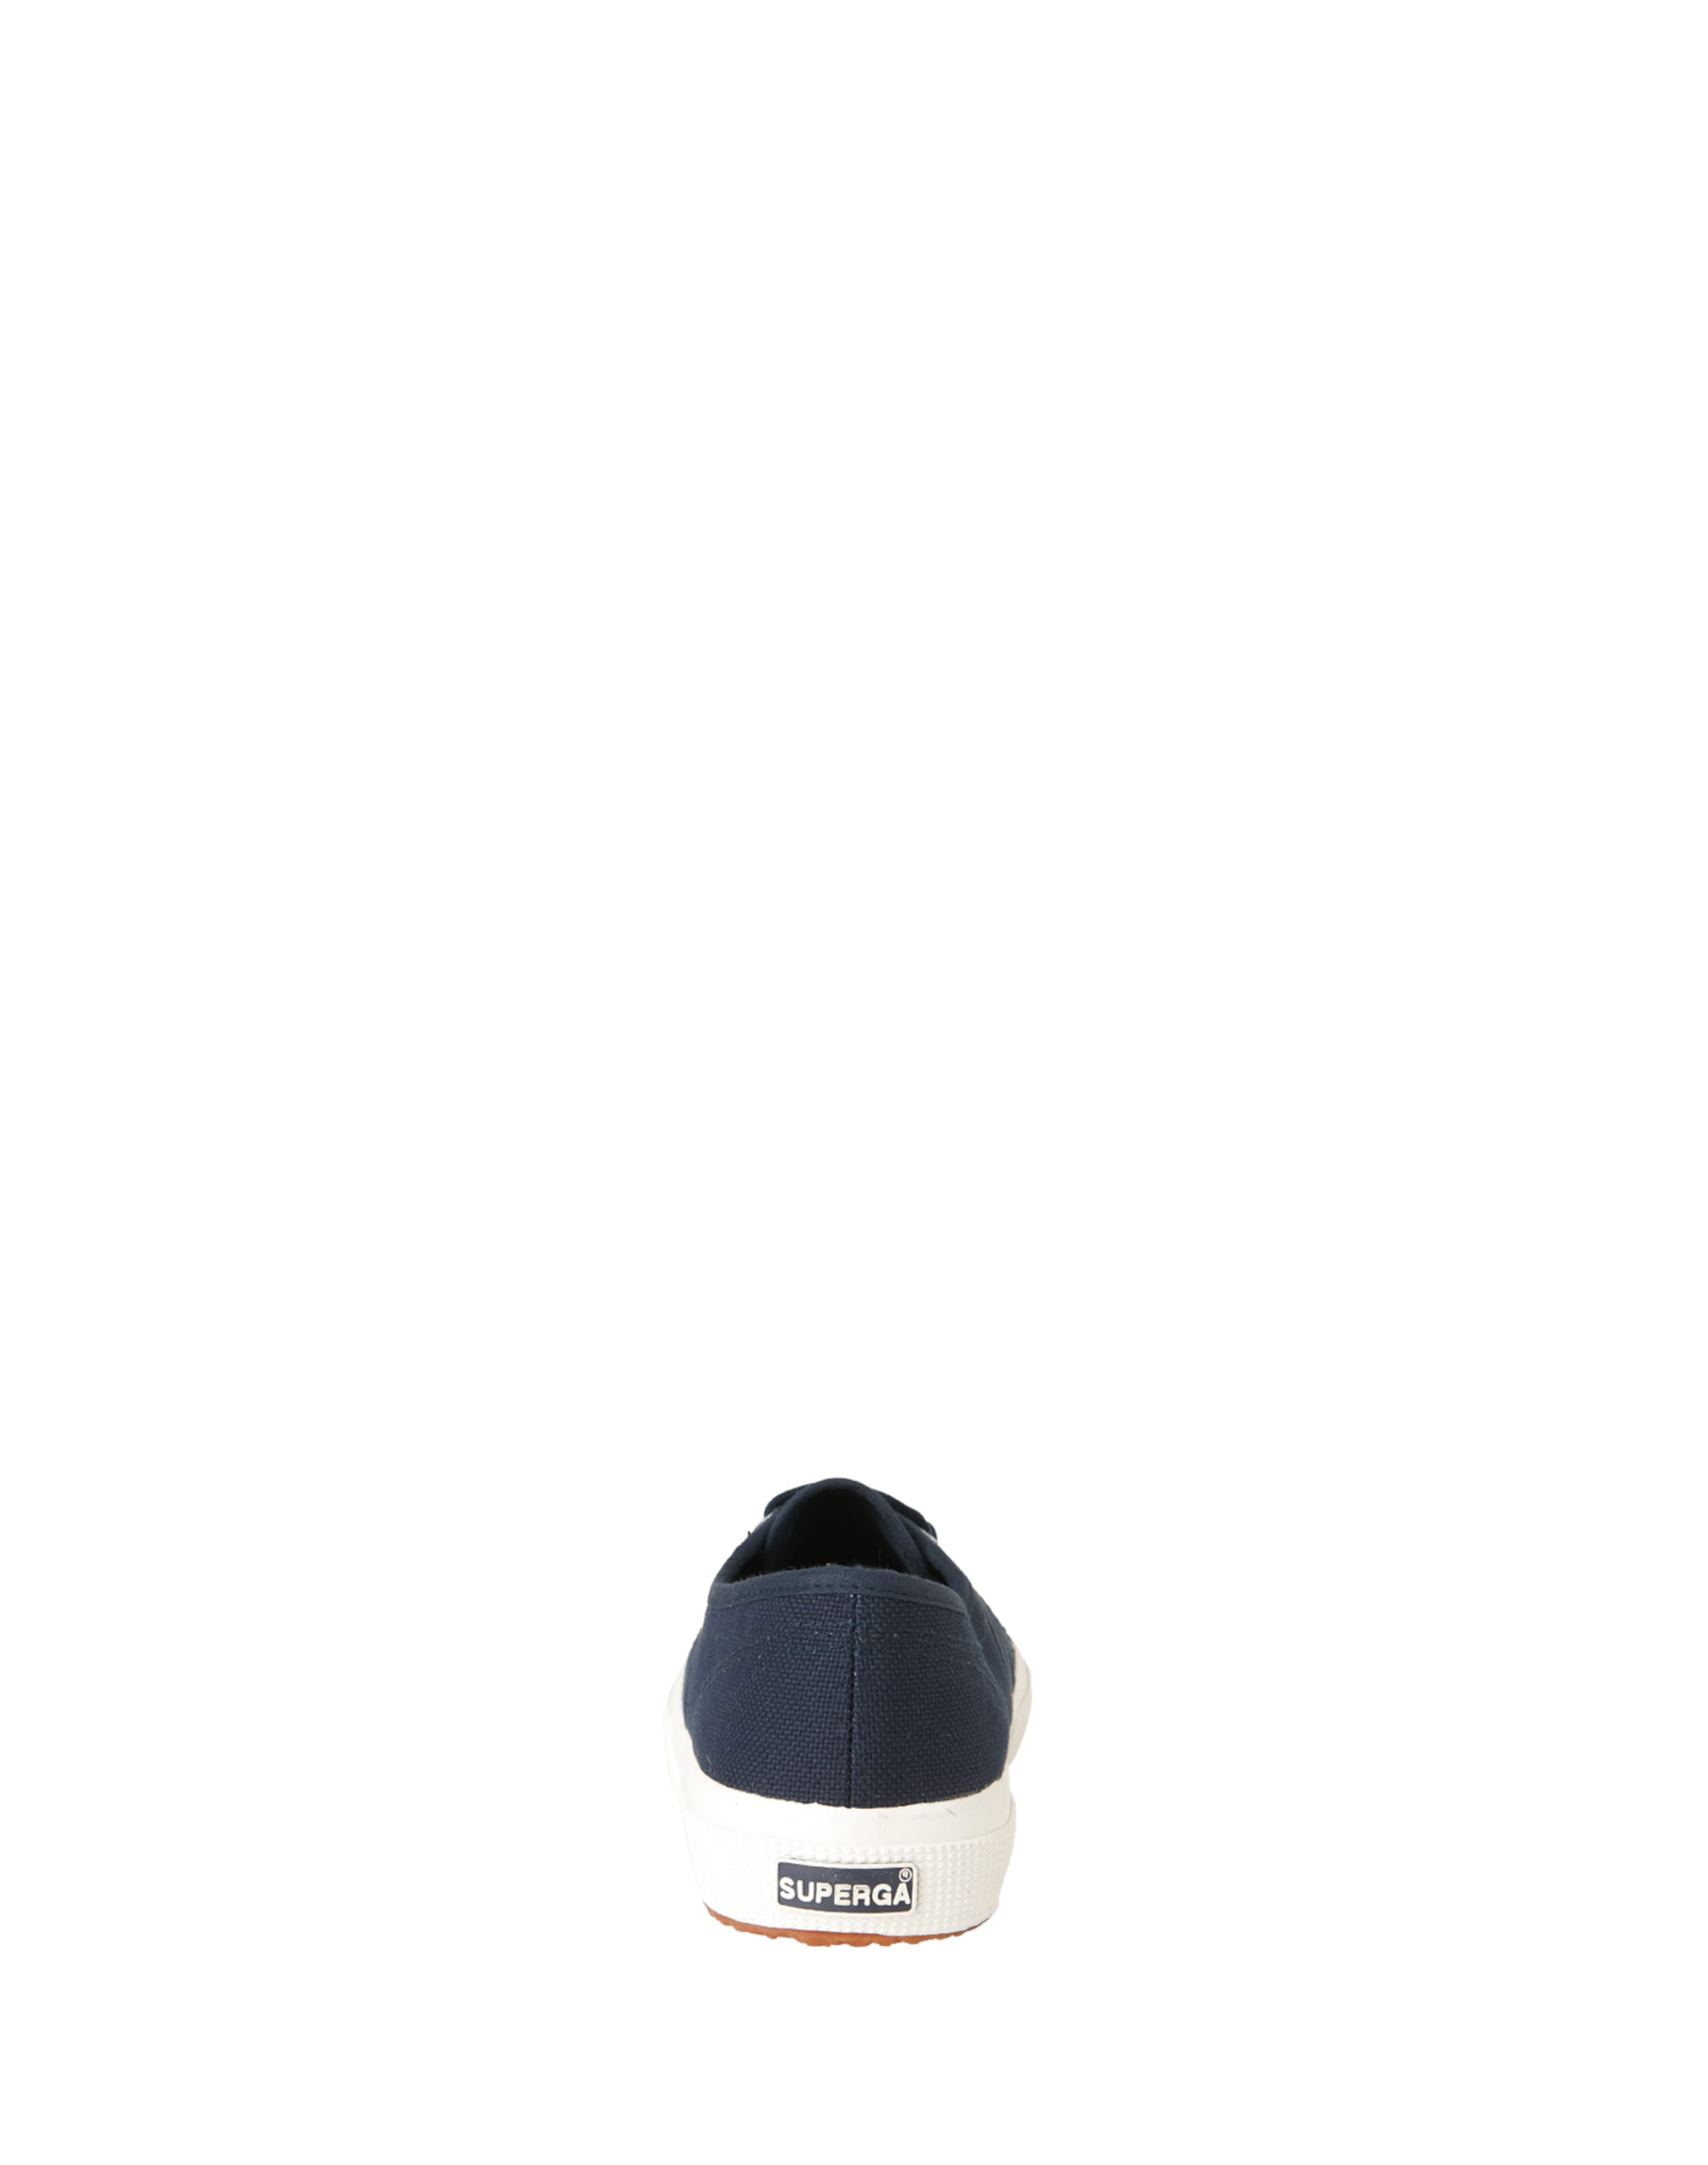 SUPERGA Canvas Turnschuhe '2750 Cotu Classic Baumwolle Großer Rabatt Rabatt Rabatt 661d15